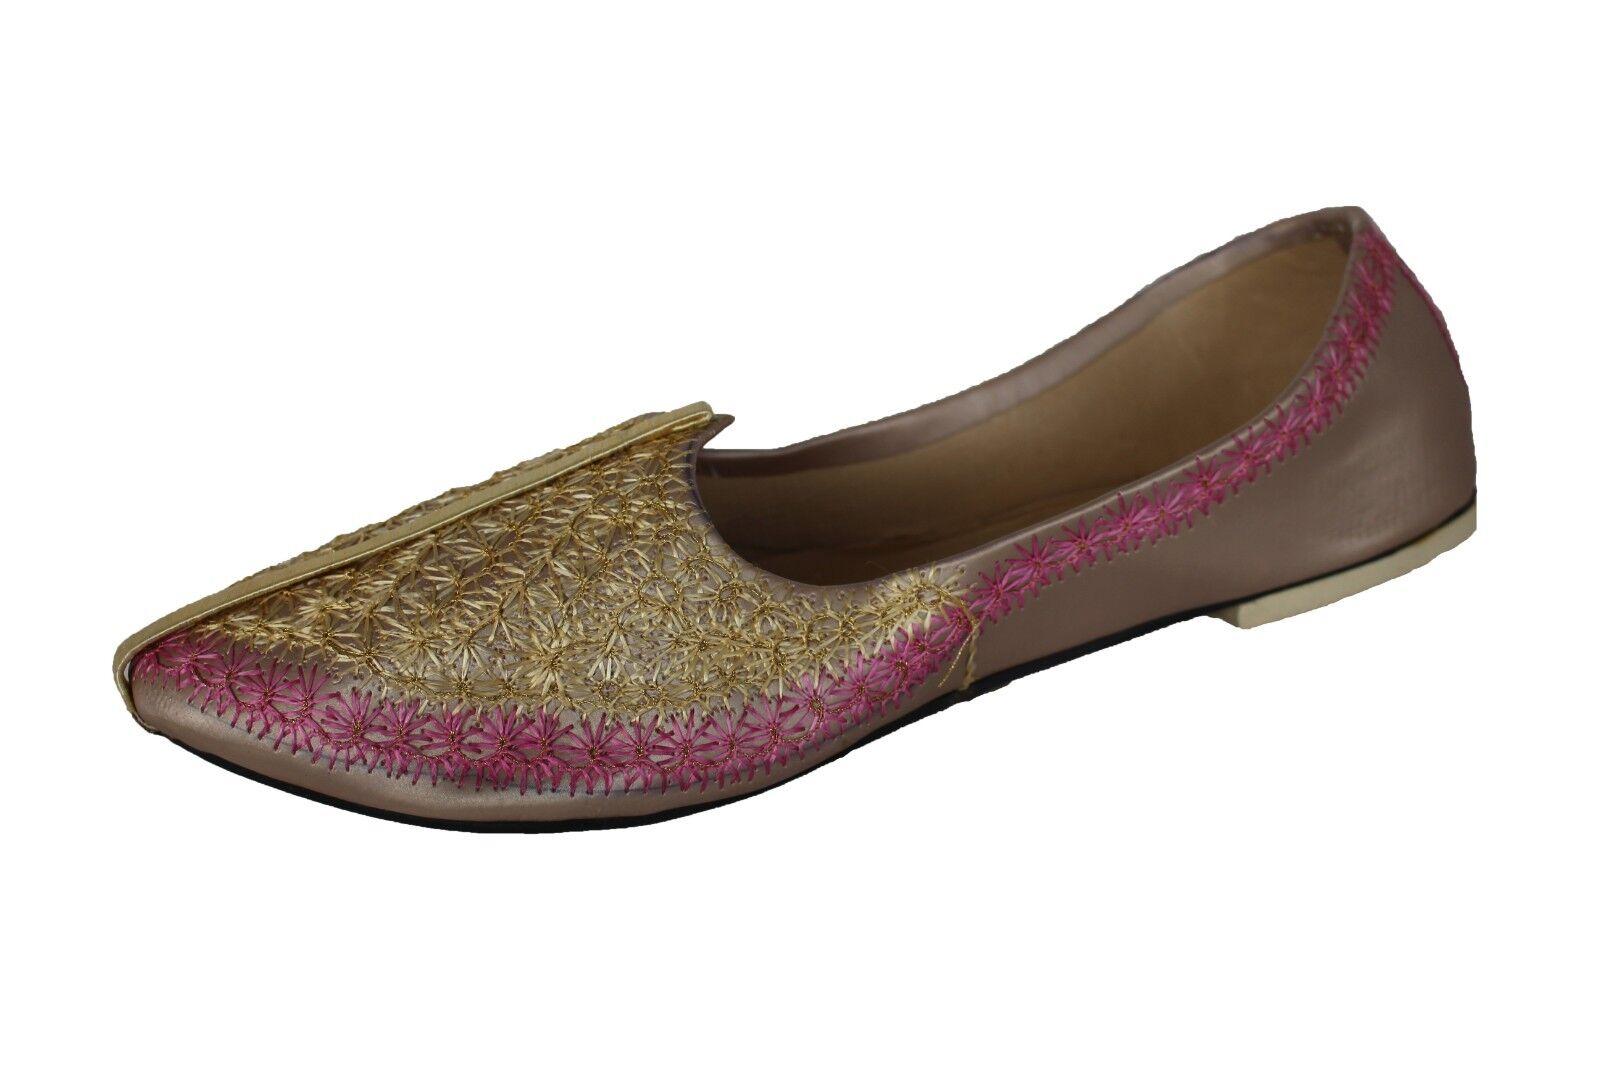 Size 7.5-13 New Indian Men's gold and Pink Mojari Khussa Jutti shoes UK SELLER